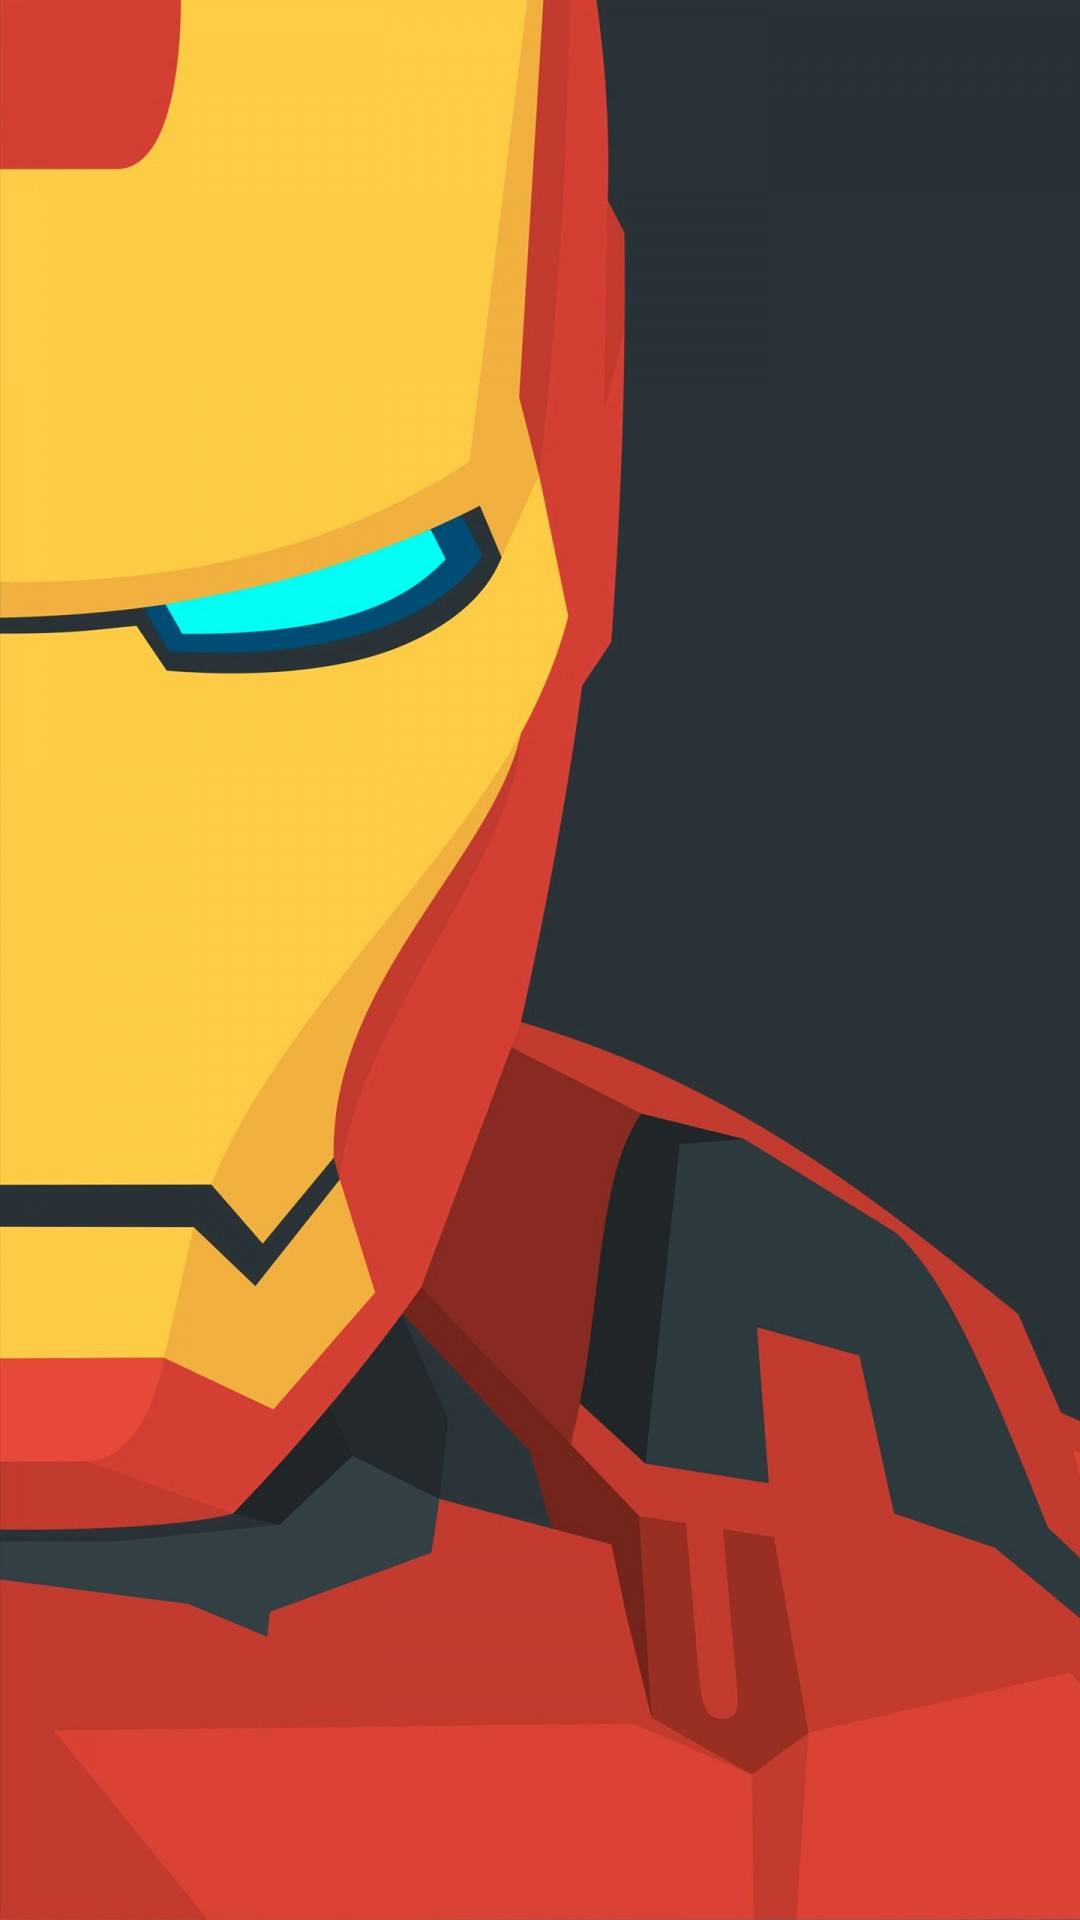 Download Iron Man Iron Man Wallpaper Iphone X 75073